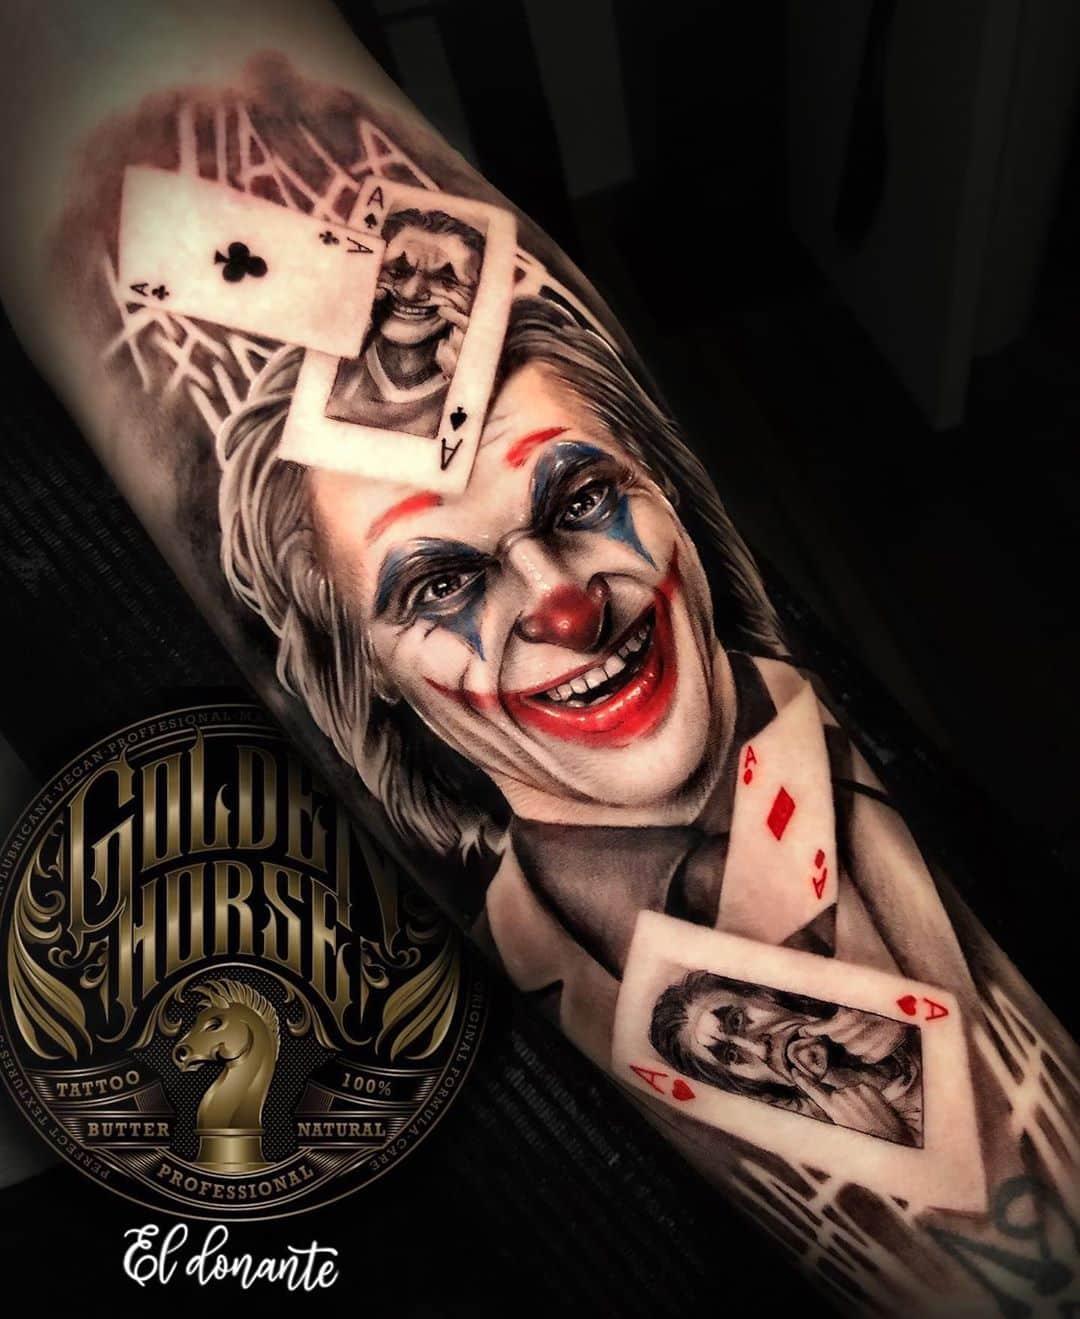 hyper-realistic-tattoo-joker